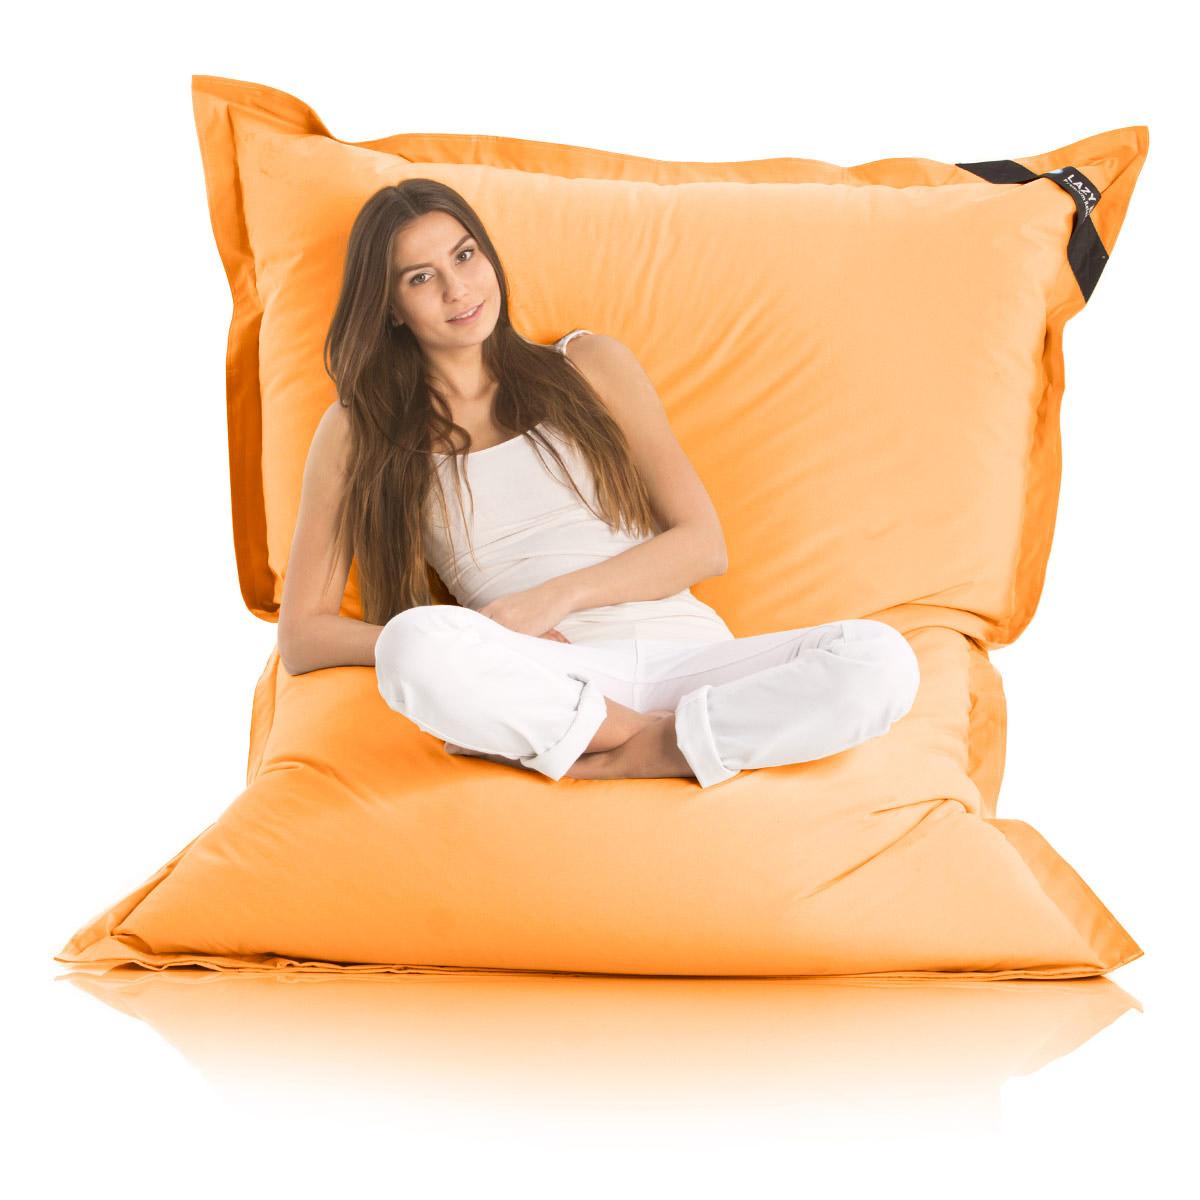 original lazy bag sitzsack xxl riesensitzsack outdoor sitzs cke xl 180x140cm ebay. Black Bedroom Furniture Sets. Home Design Ideas